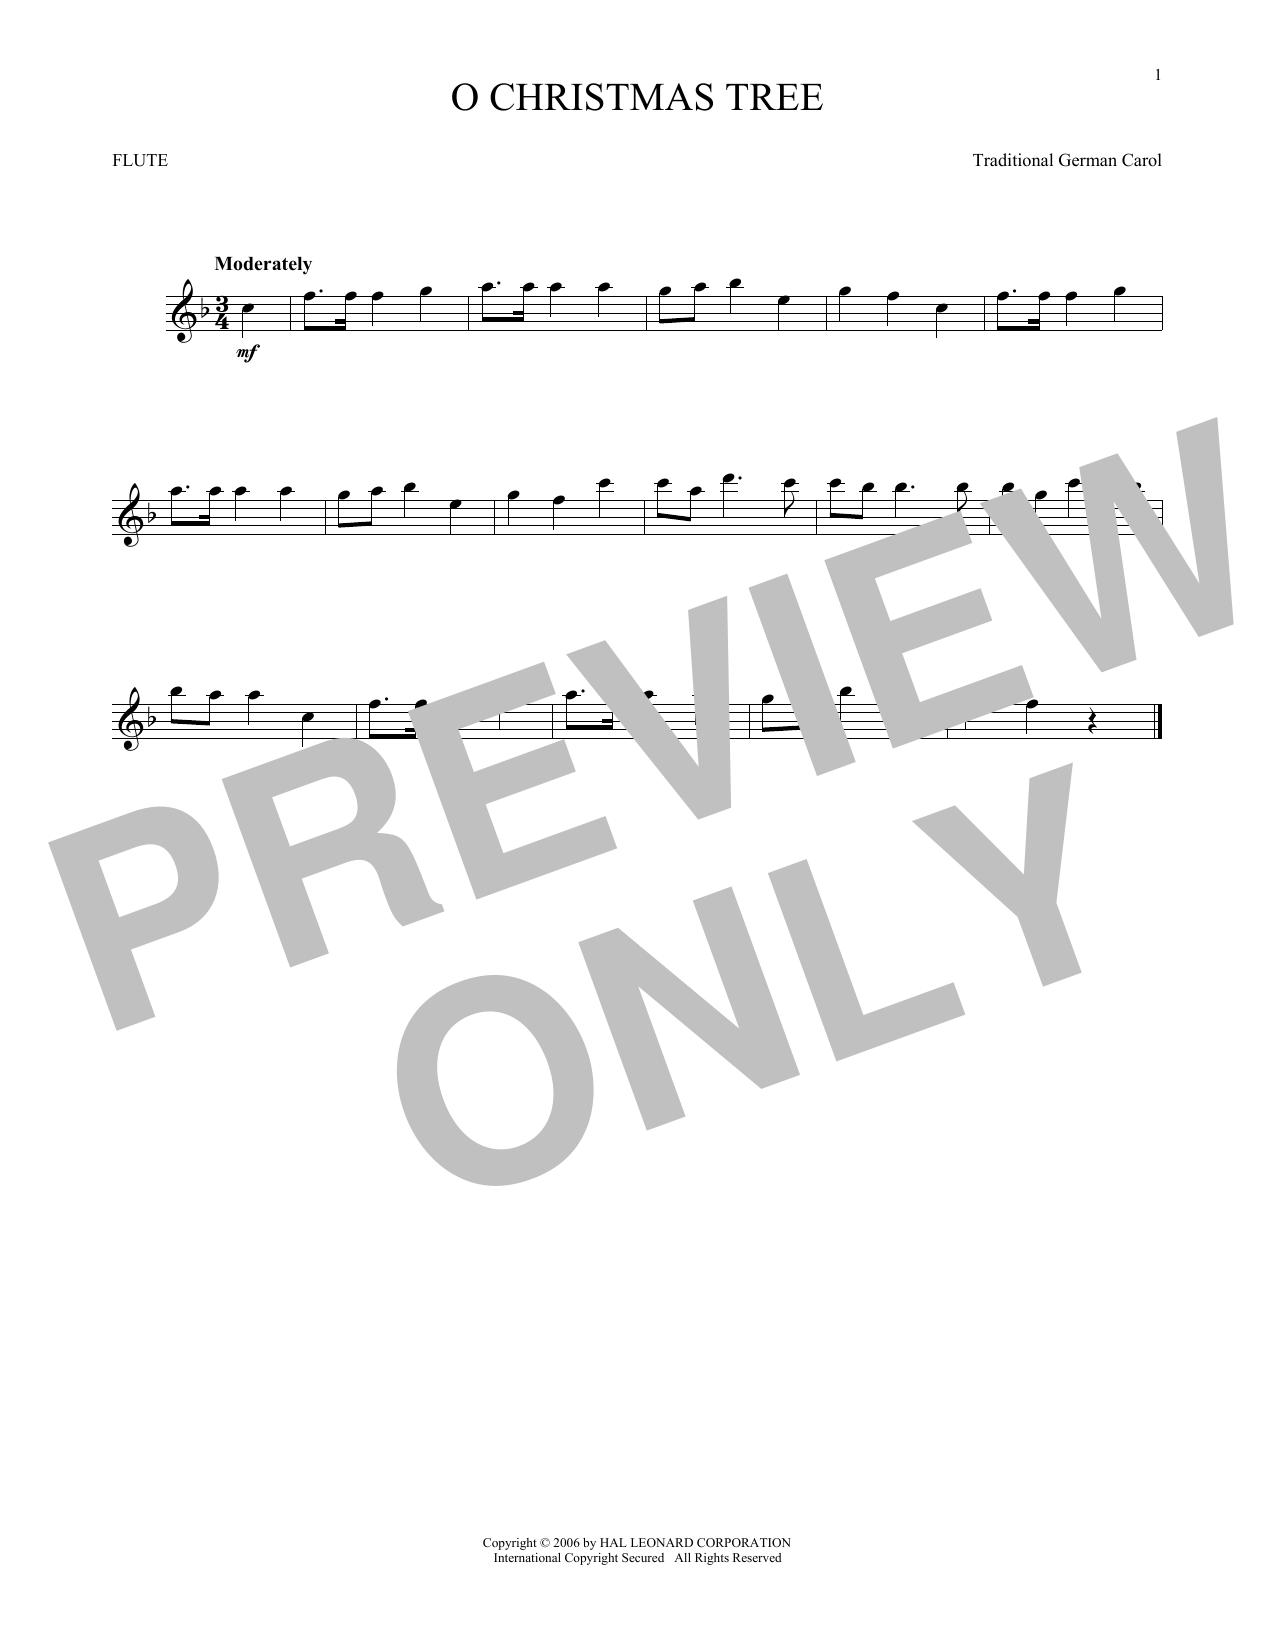 Partition flûte O Christmas Tree de Traditional German Carol - Flute traversiere